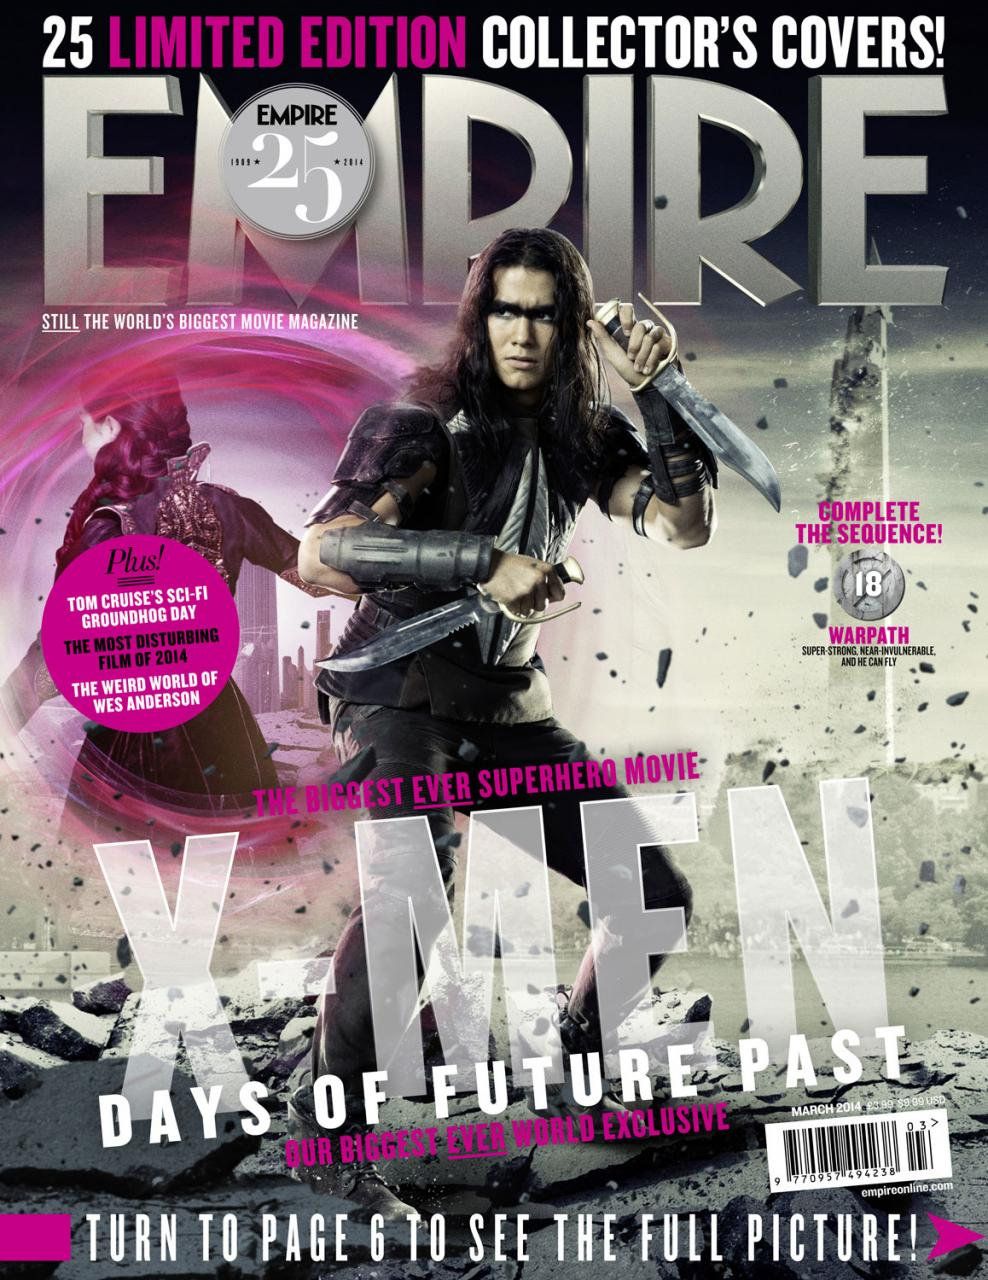 Empire Xmen Days Of Future Past Covers (2)